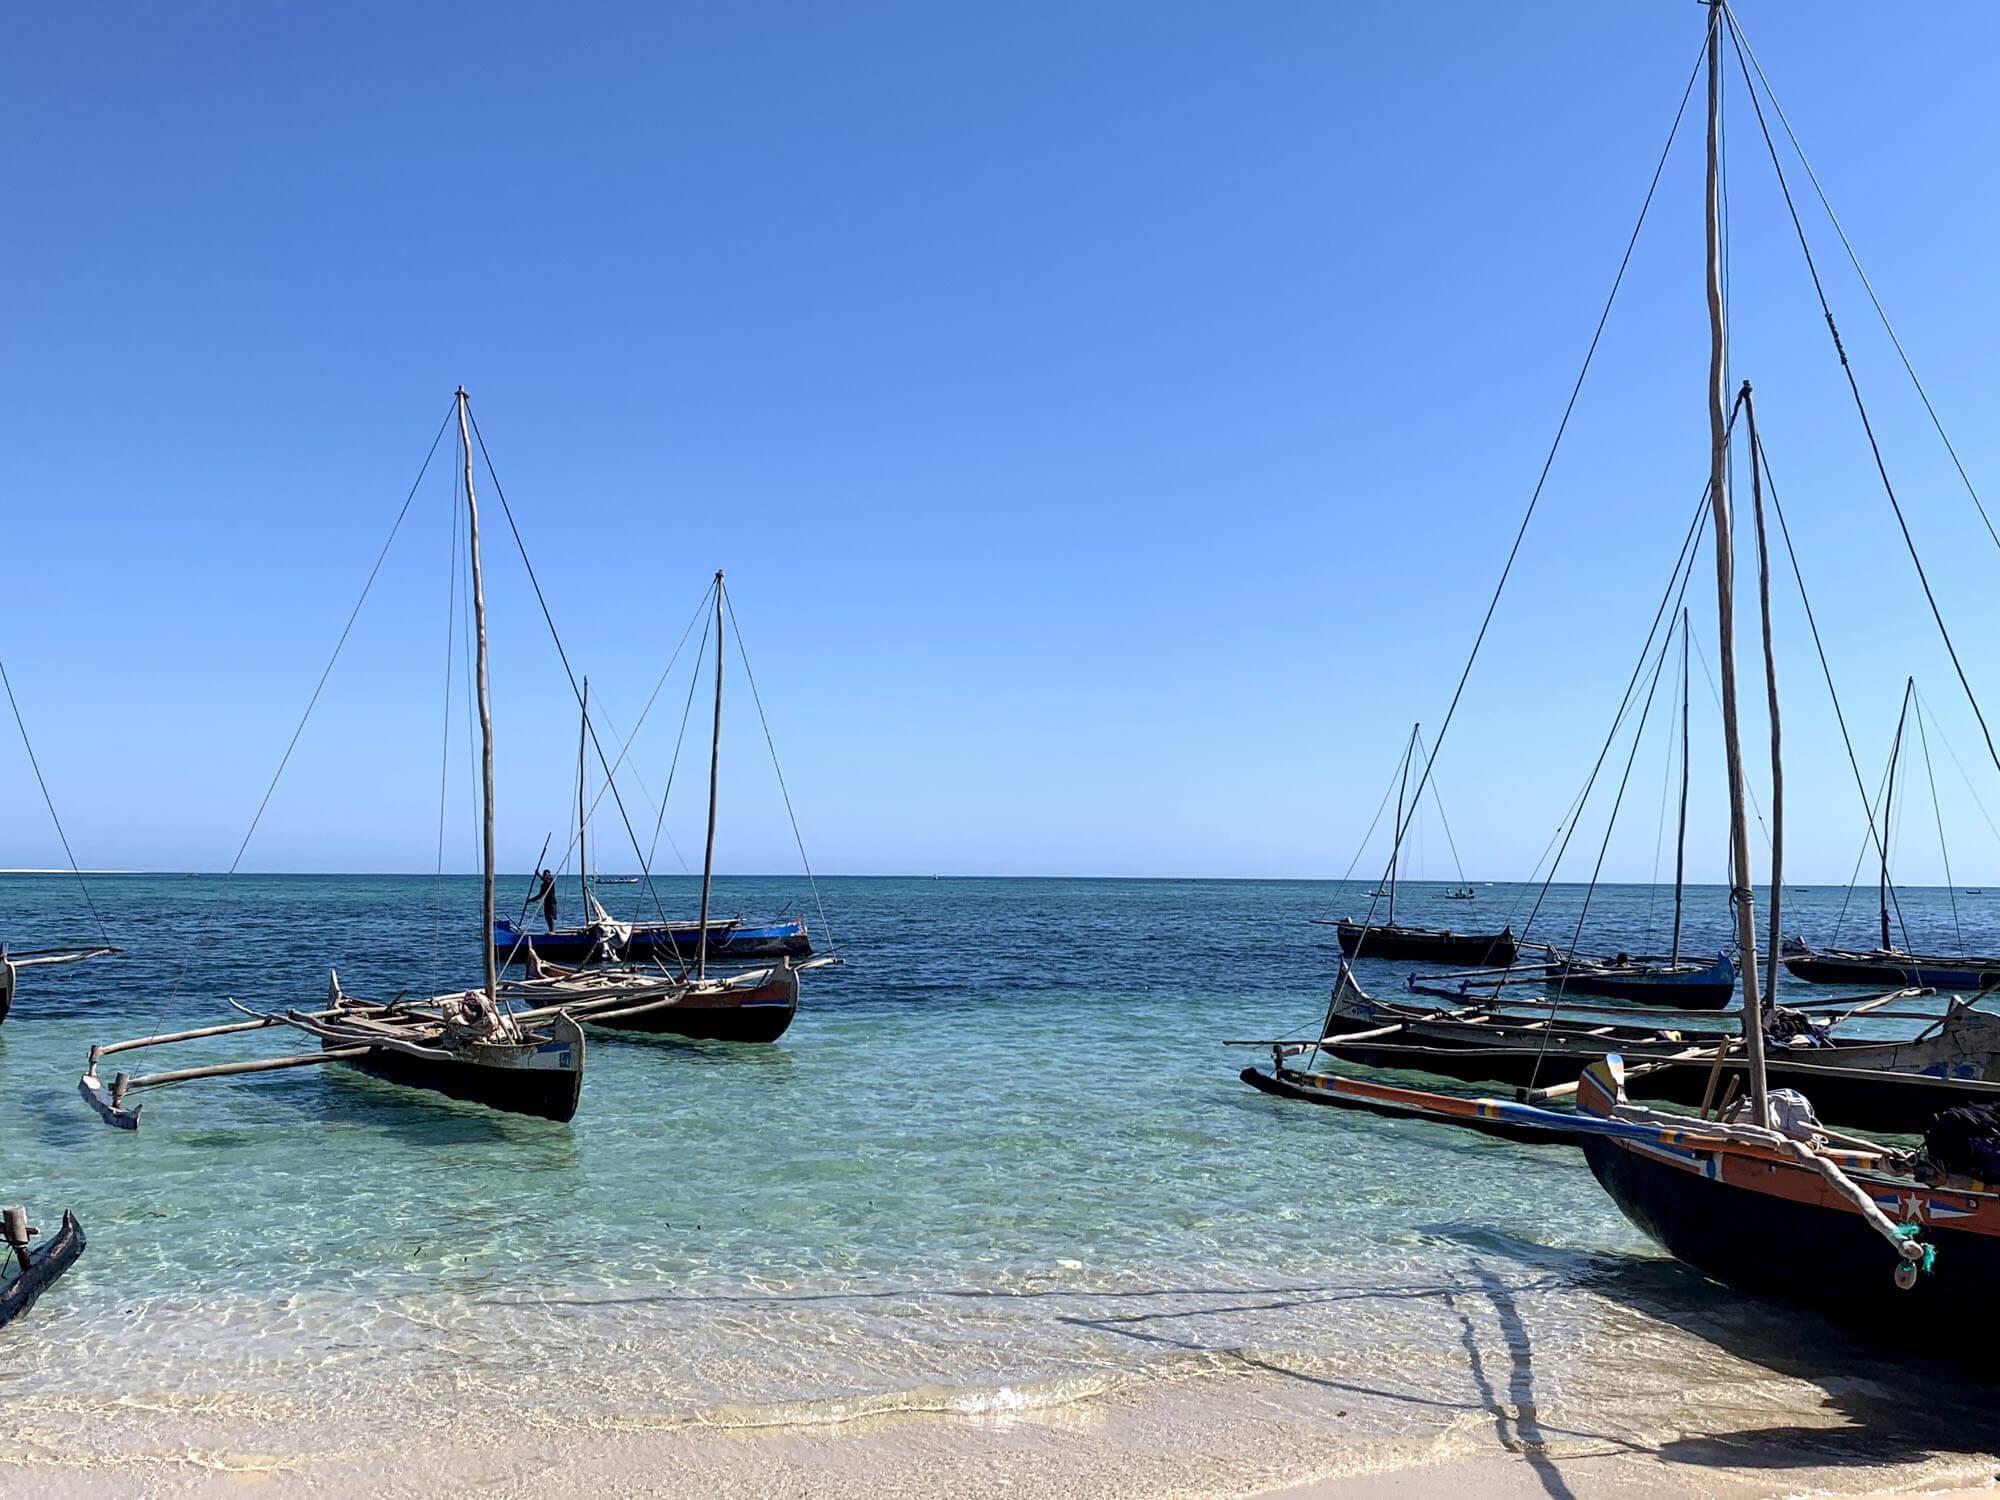 Mada039 VIAGGIO IN MADAGASCAR